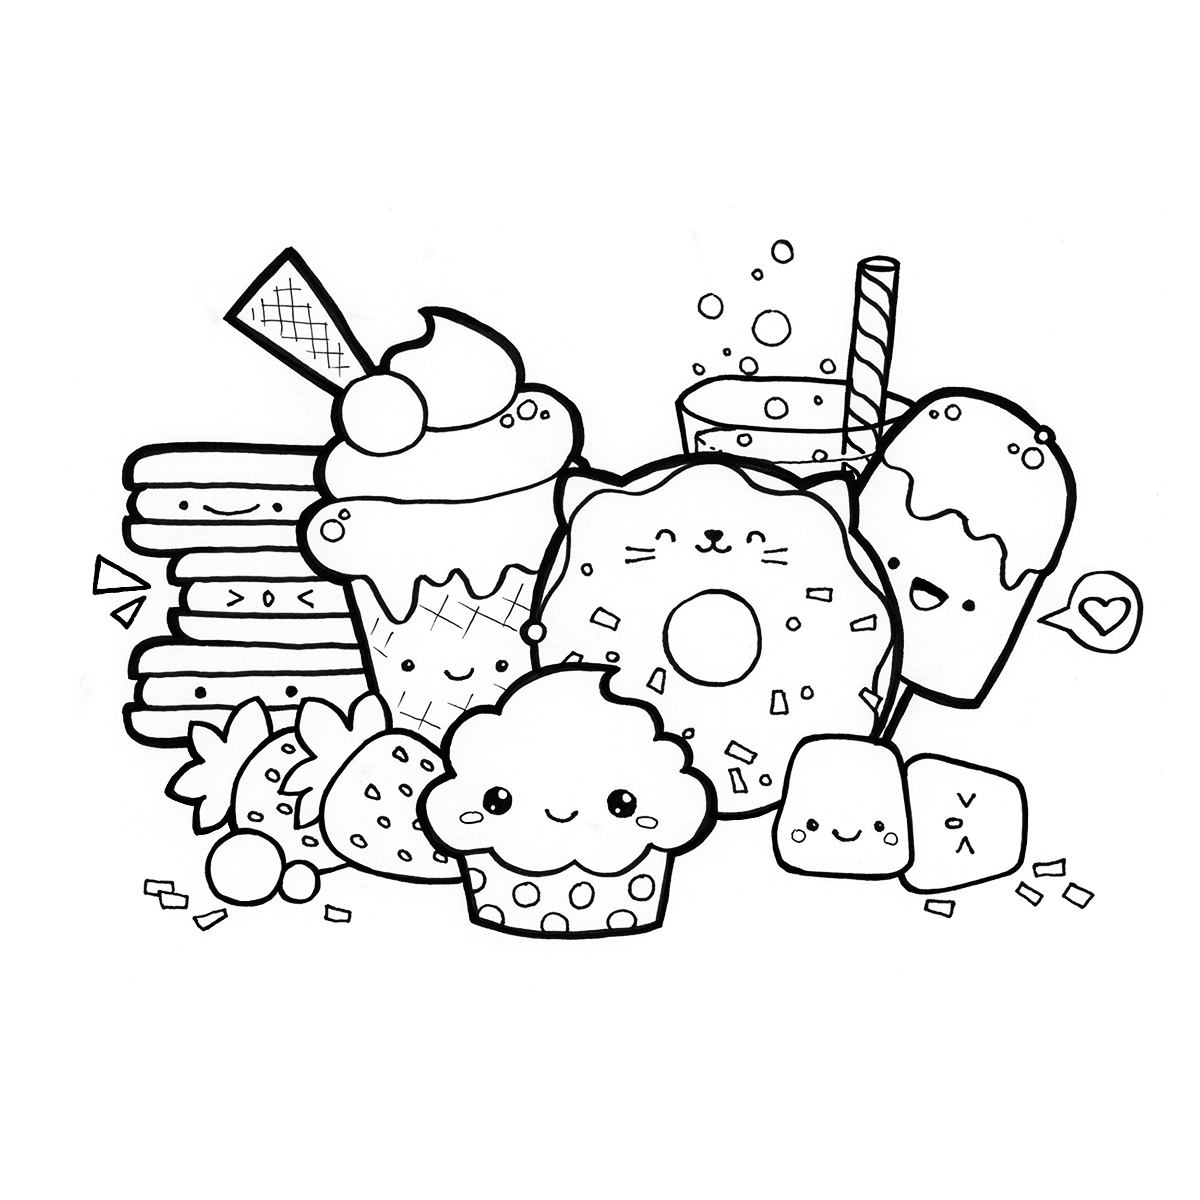 Kawaii Doodle Food Coloring Page Download Pdf At Https Kawaiidrawings Com Kawaii Food Doodle Coloring Cute Doodle Art Cute Coloring Pages Doodle Coloring